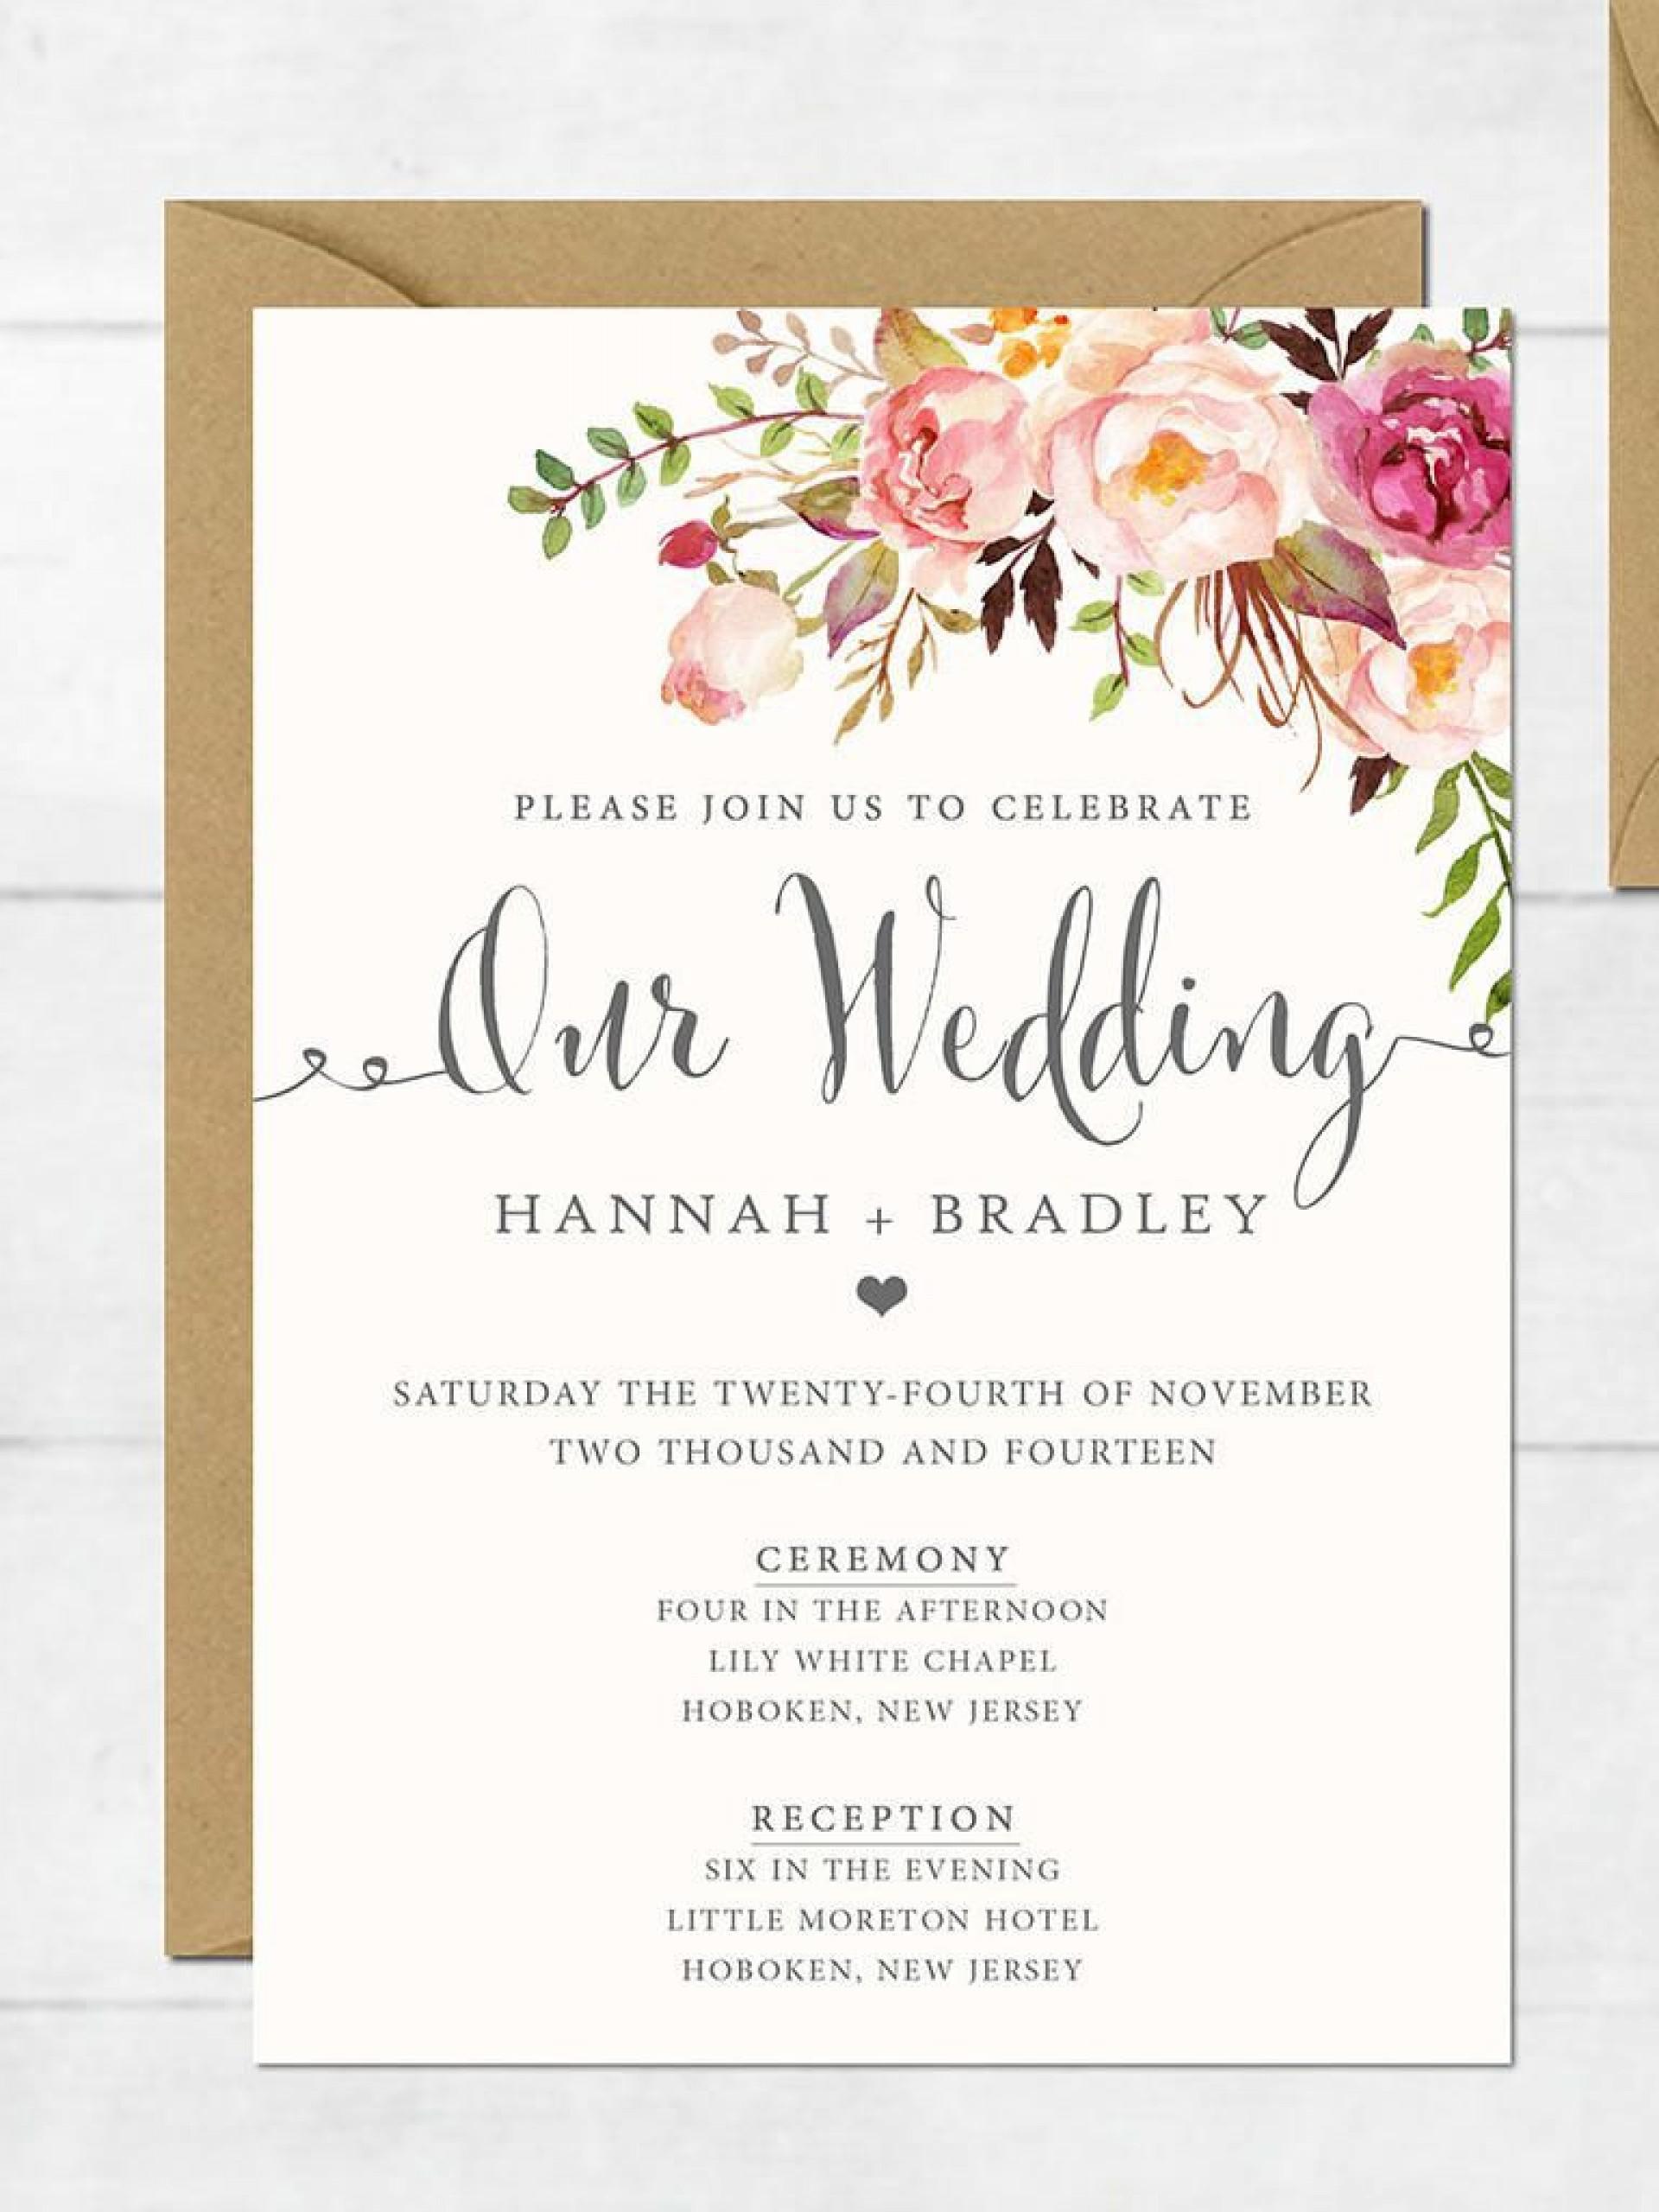 002 Fascinating Elegant Wedding Menu Card Template Picture  Templates1920